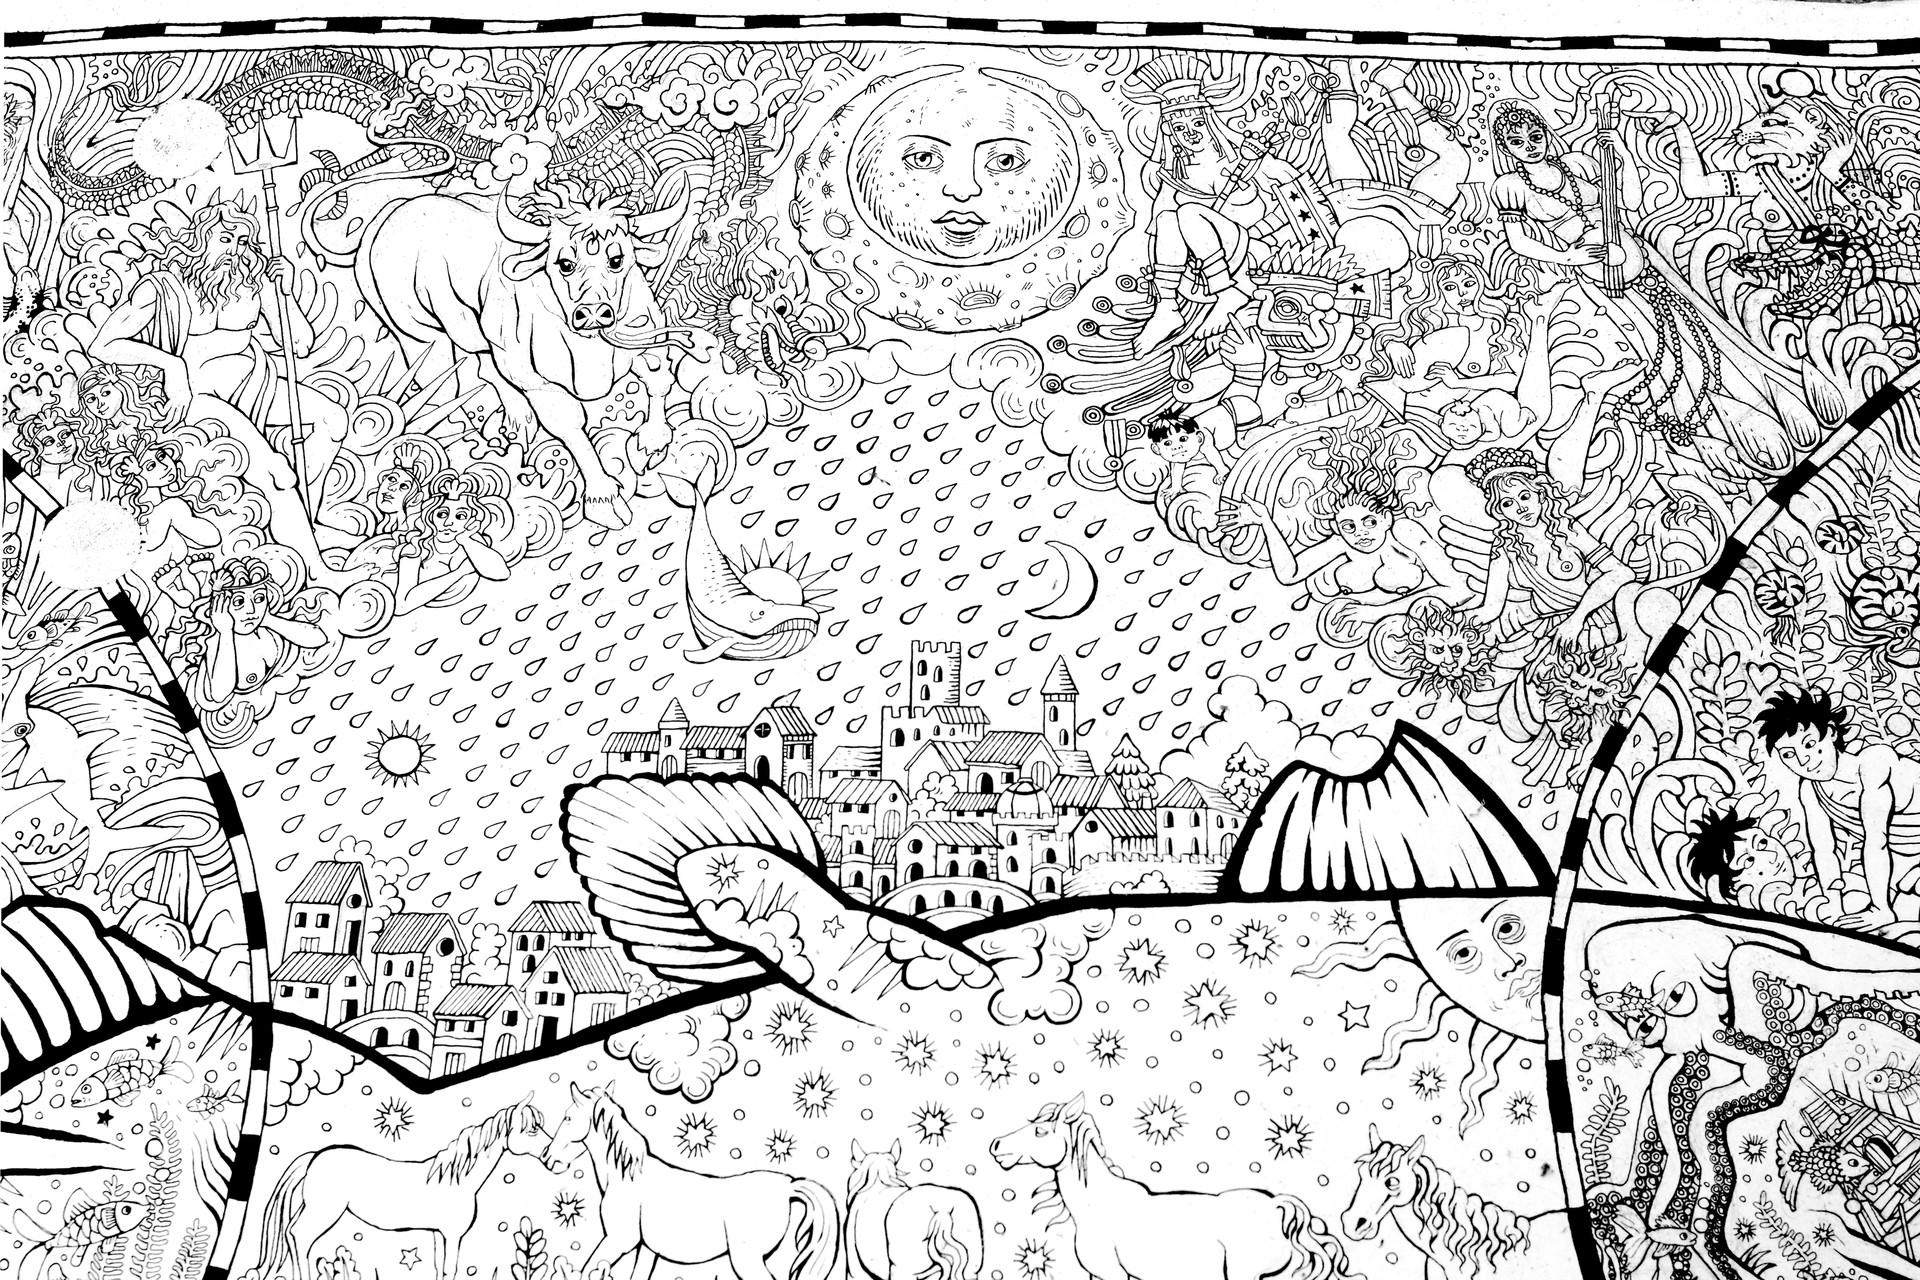 Agathe pitie coelacanthe detail 04 copie